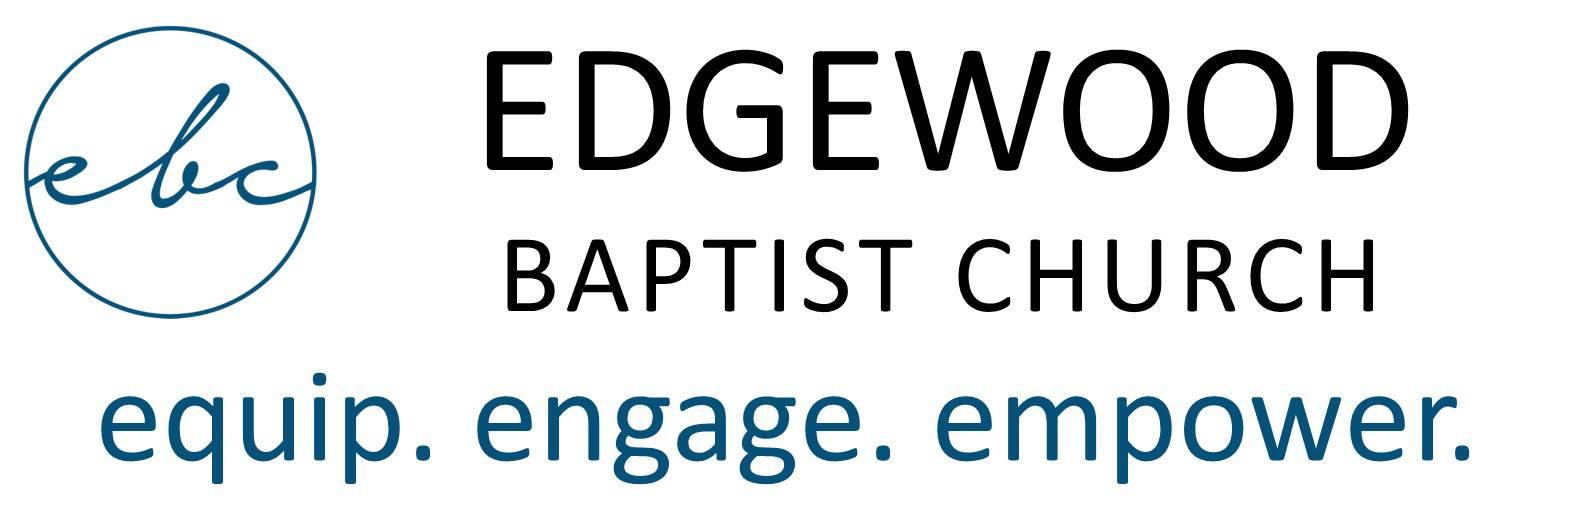 Edgewood Baptist Church Lakeland